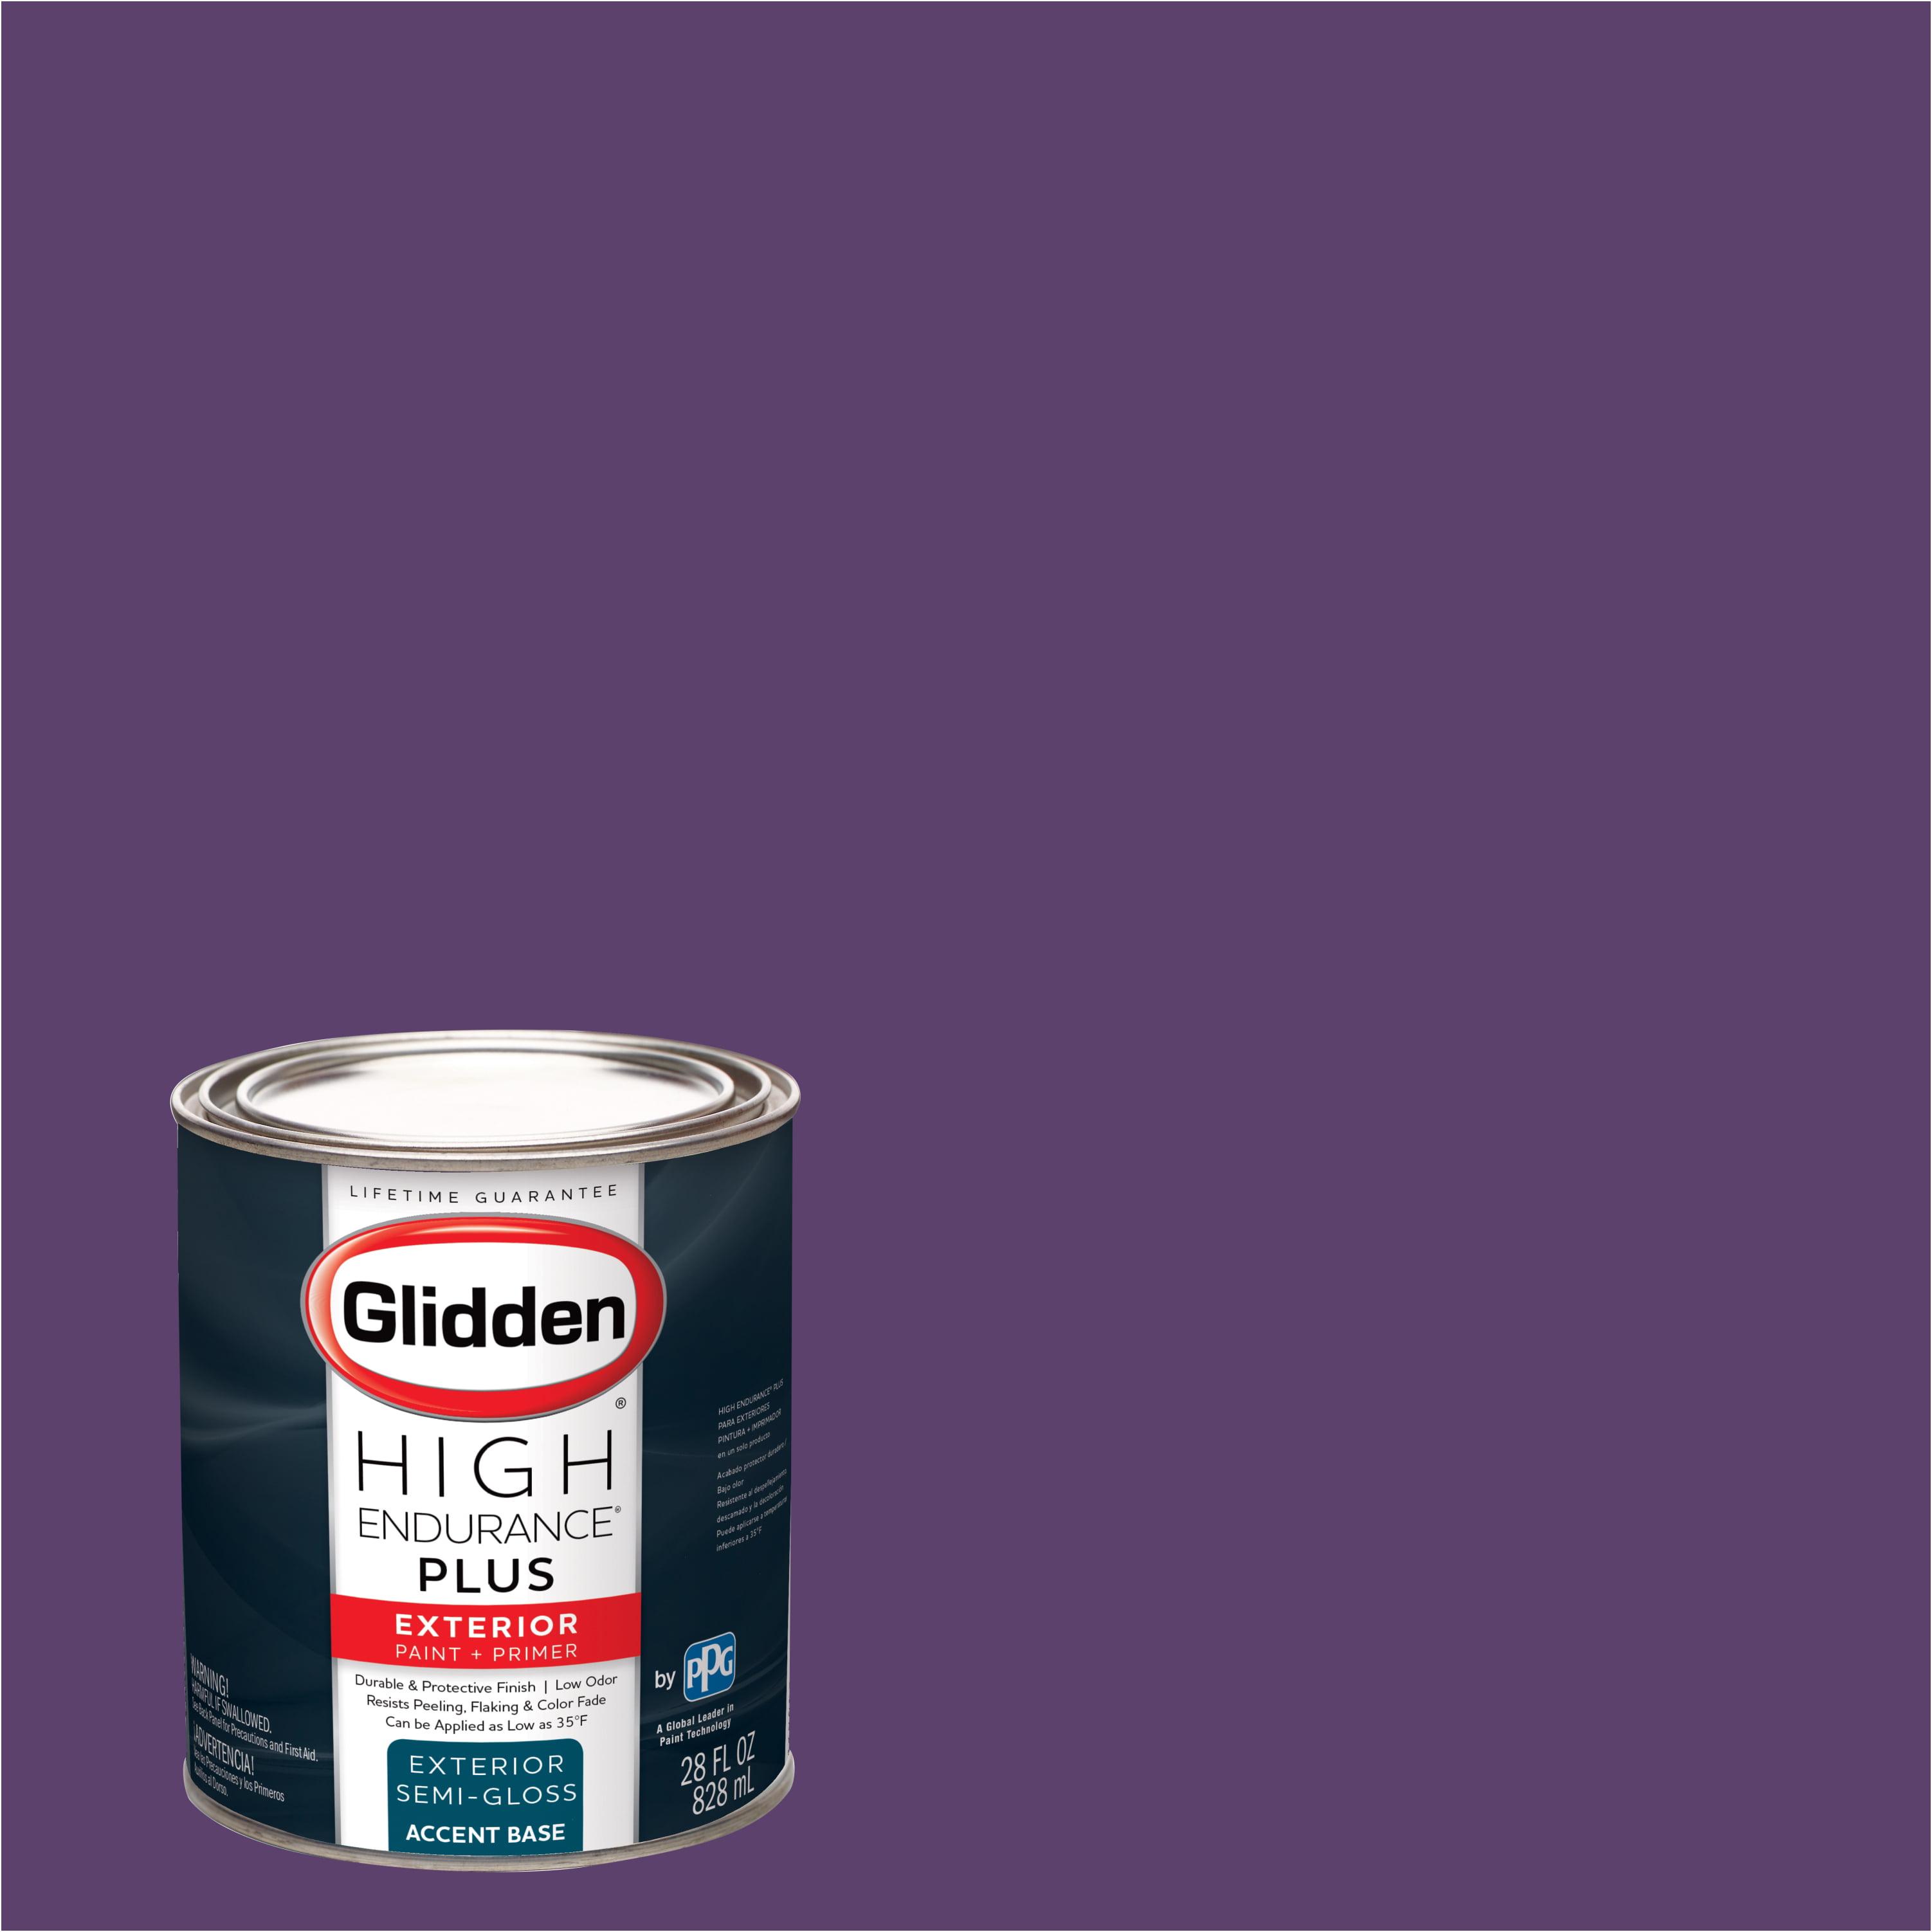 Glidden High Endurance Plus Exterior Paint and Primer, Regal Purple, #56RB 09/302